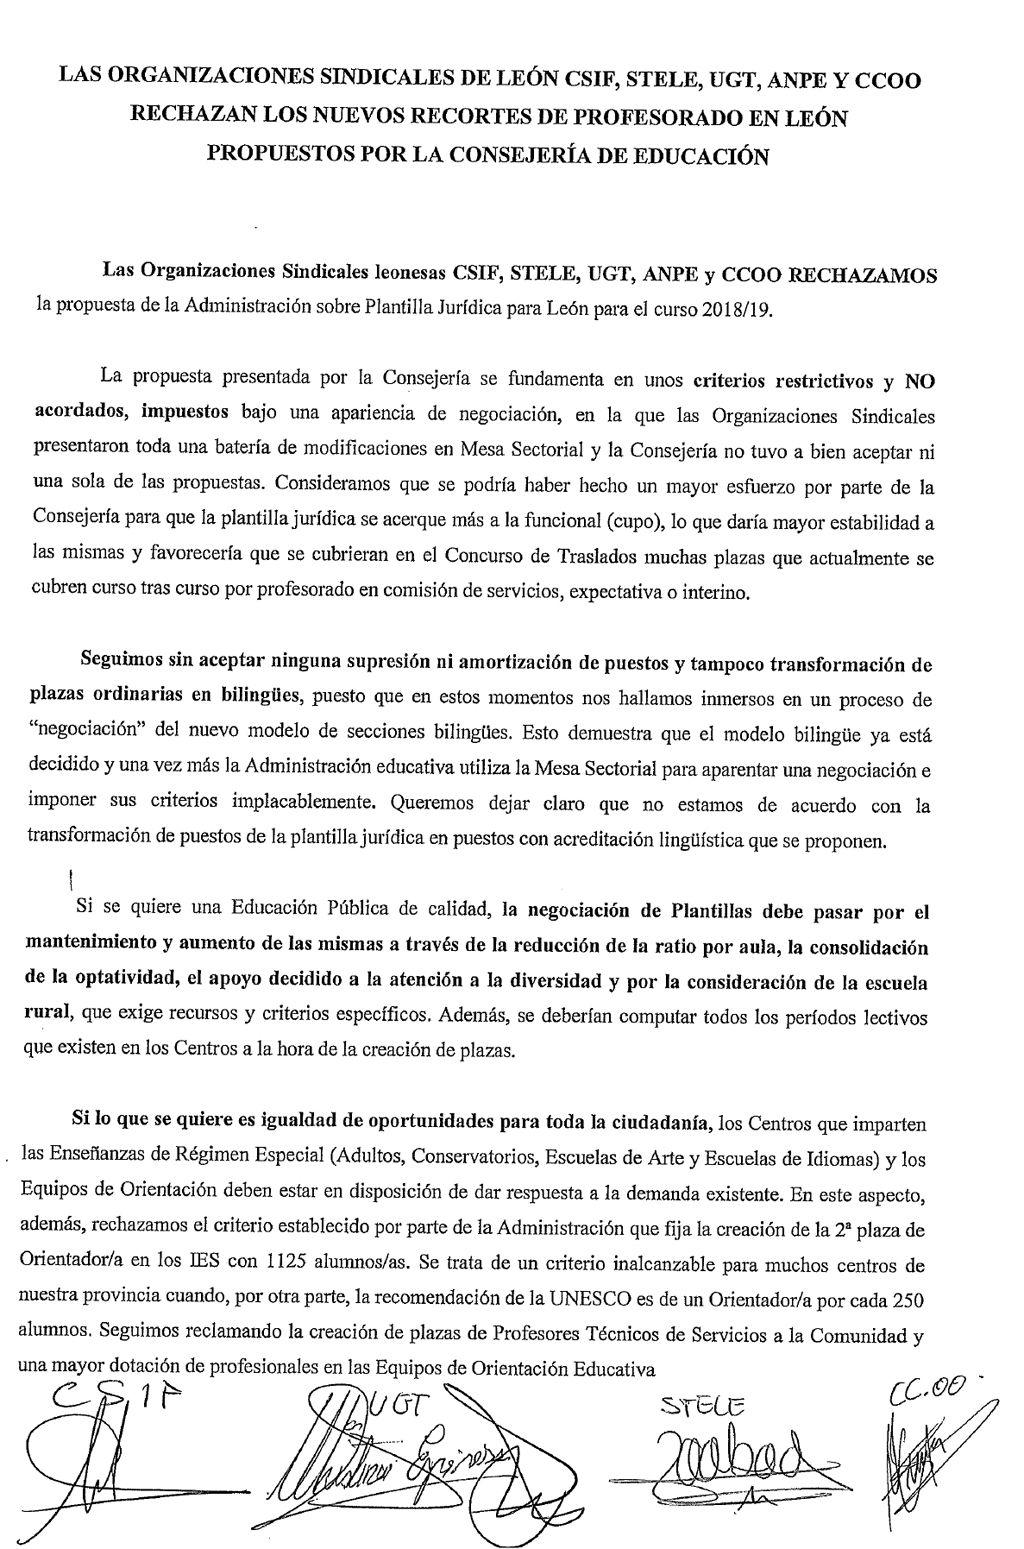 Comunicado-OOSS-Negociacion-Plantillas-LE-01